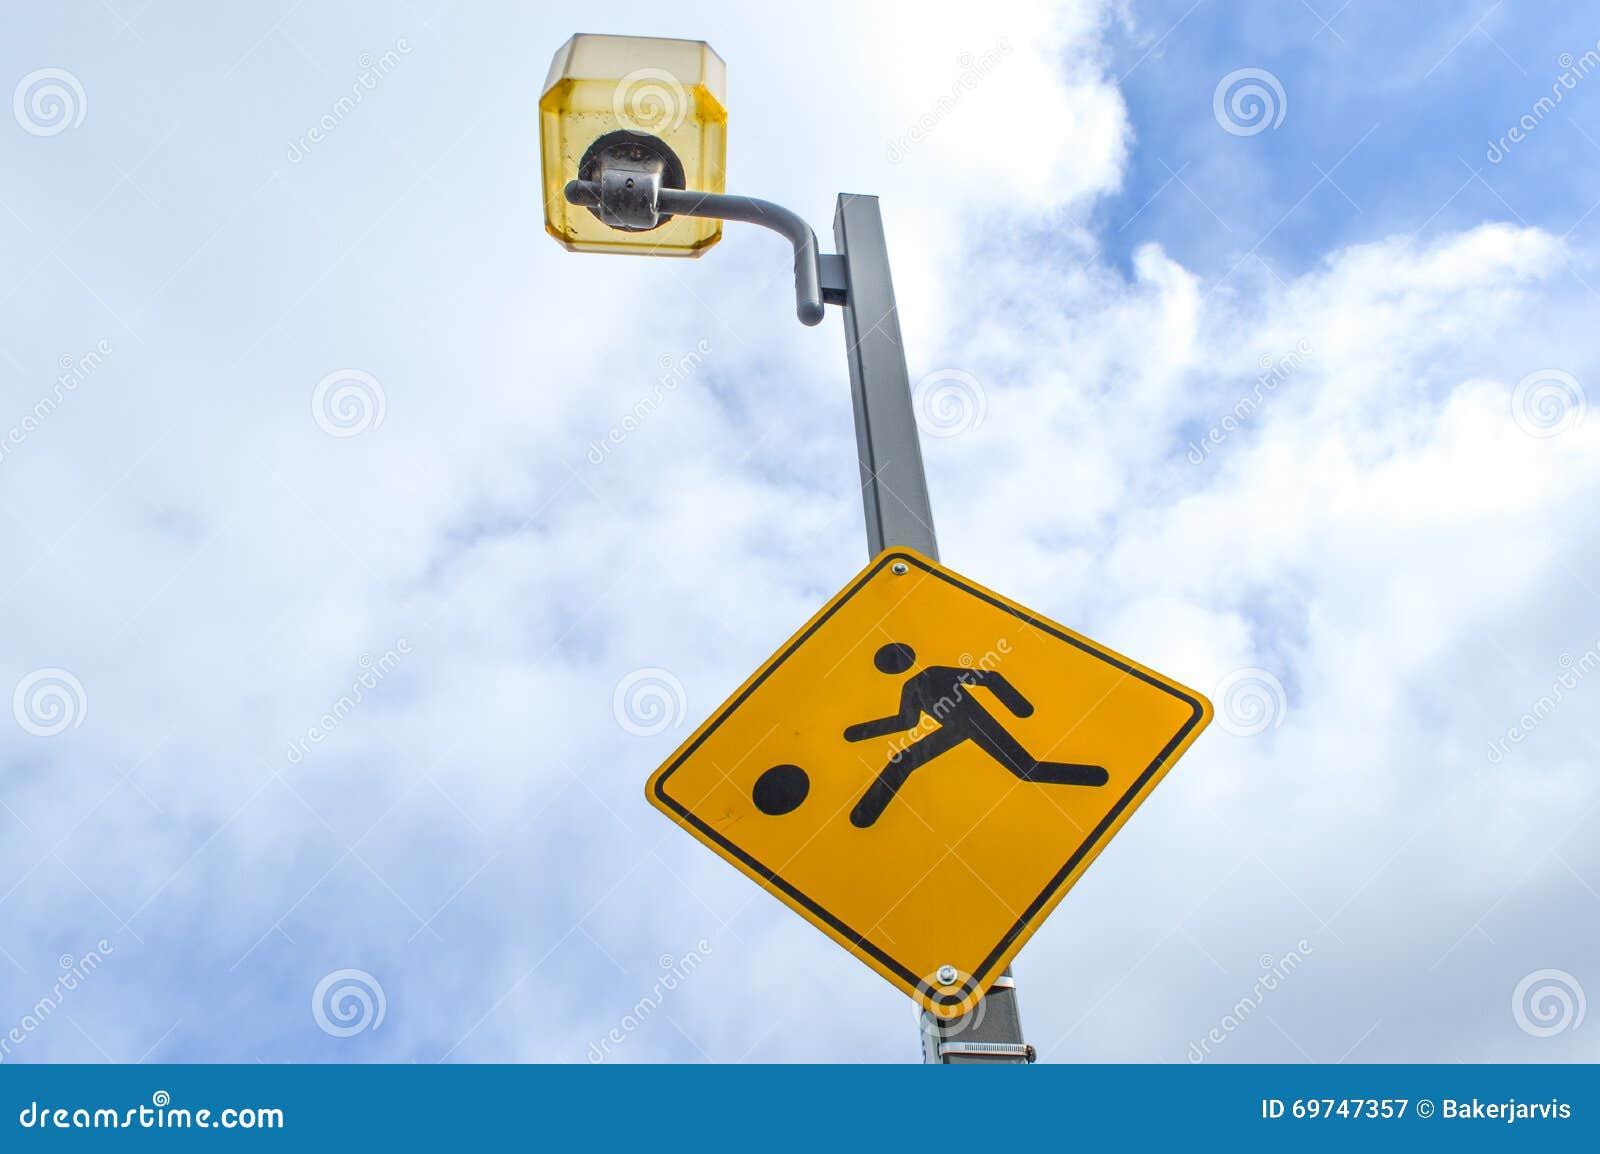 Slow children caution sign